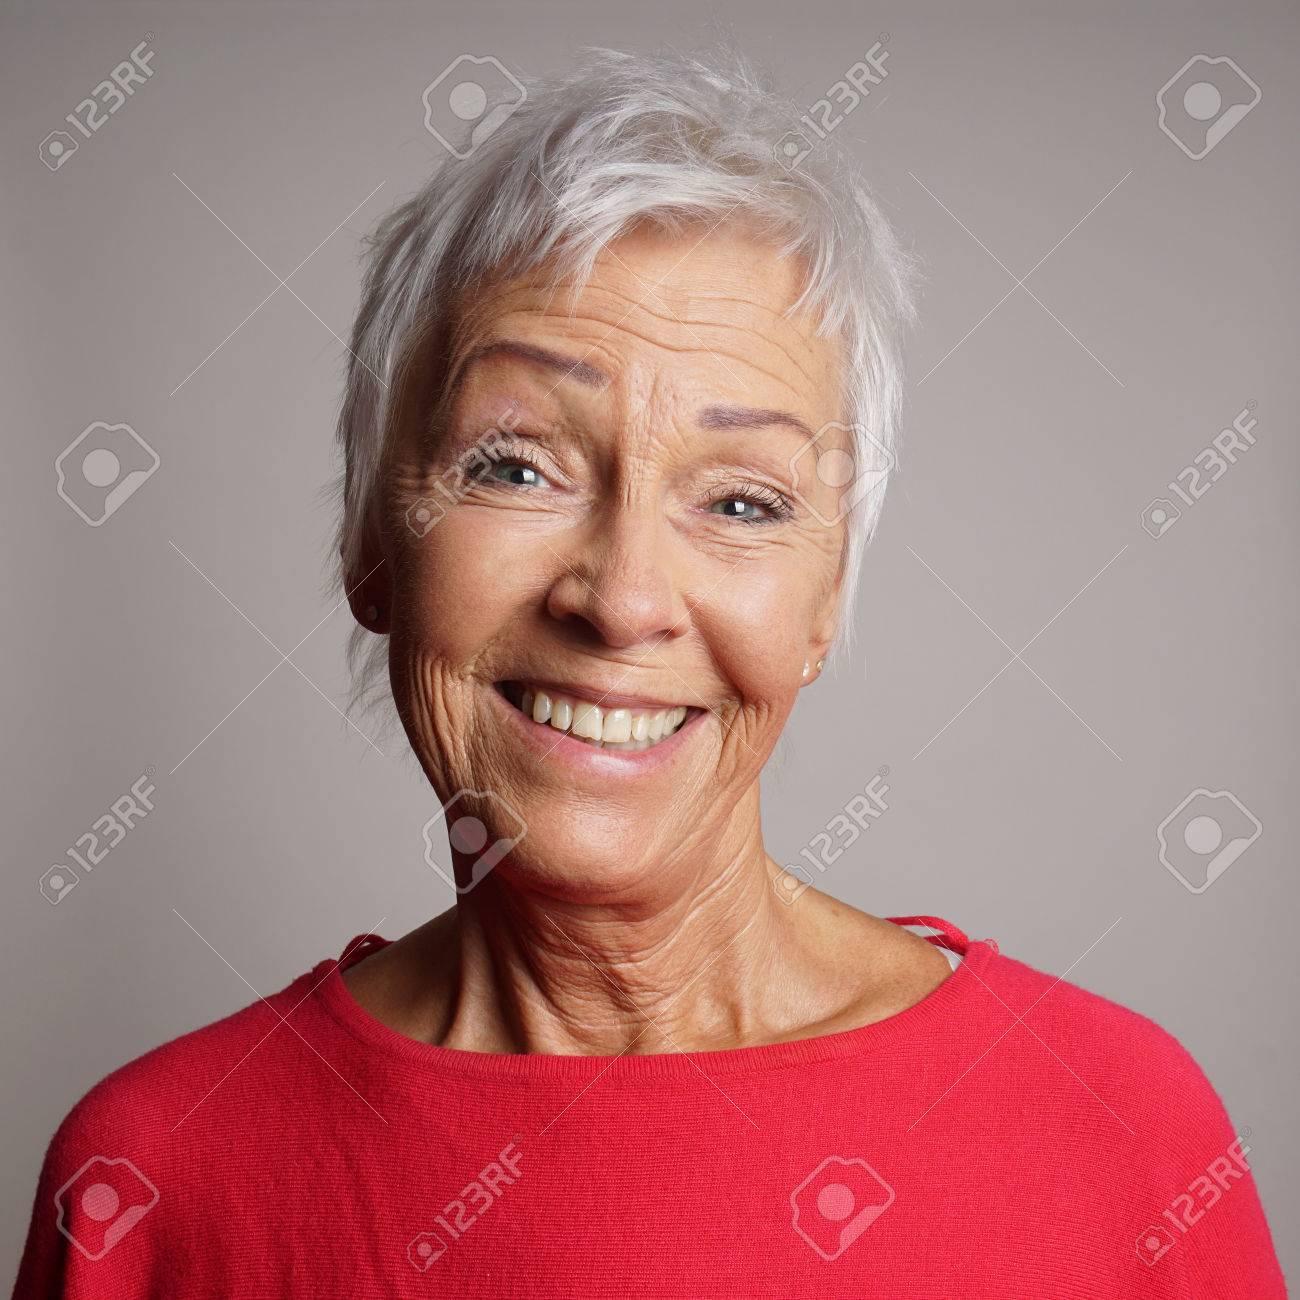 Cabello corto senora mayor